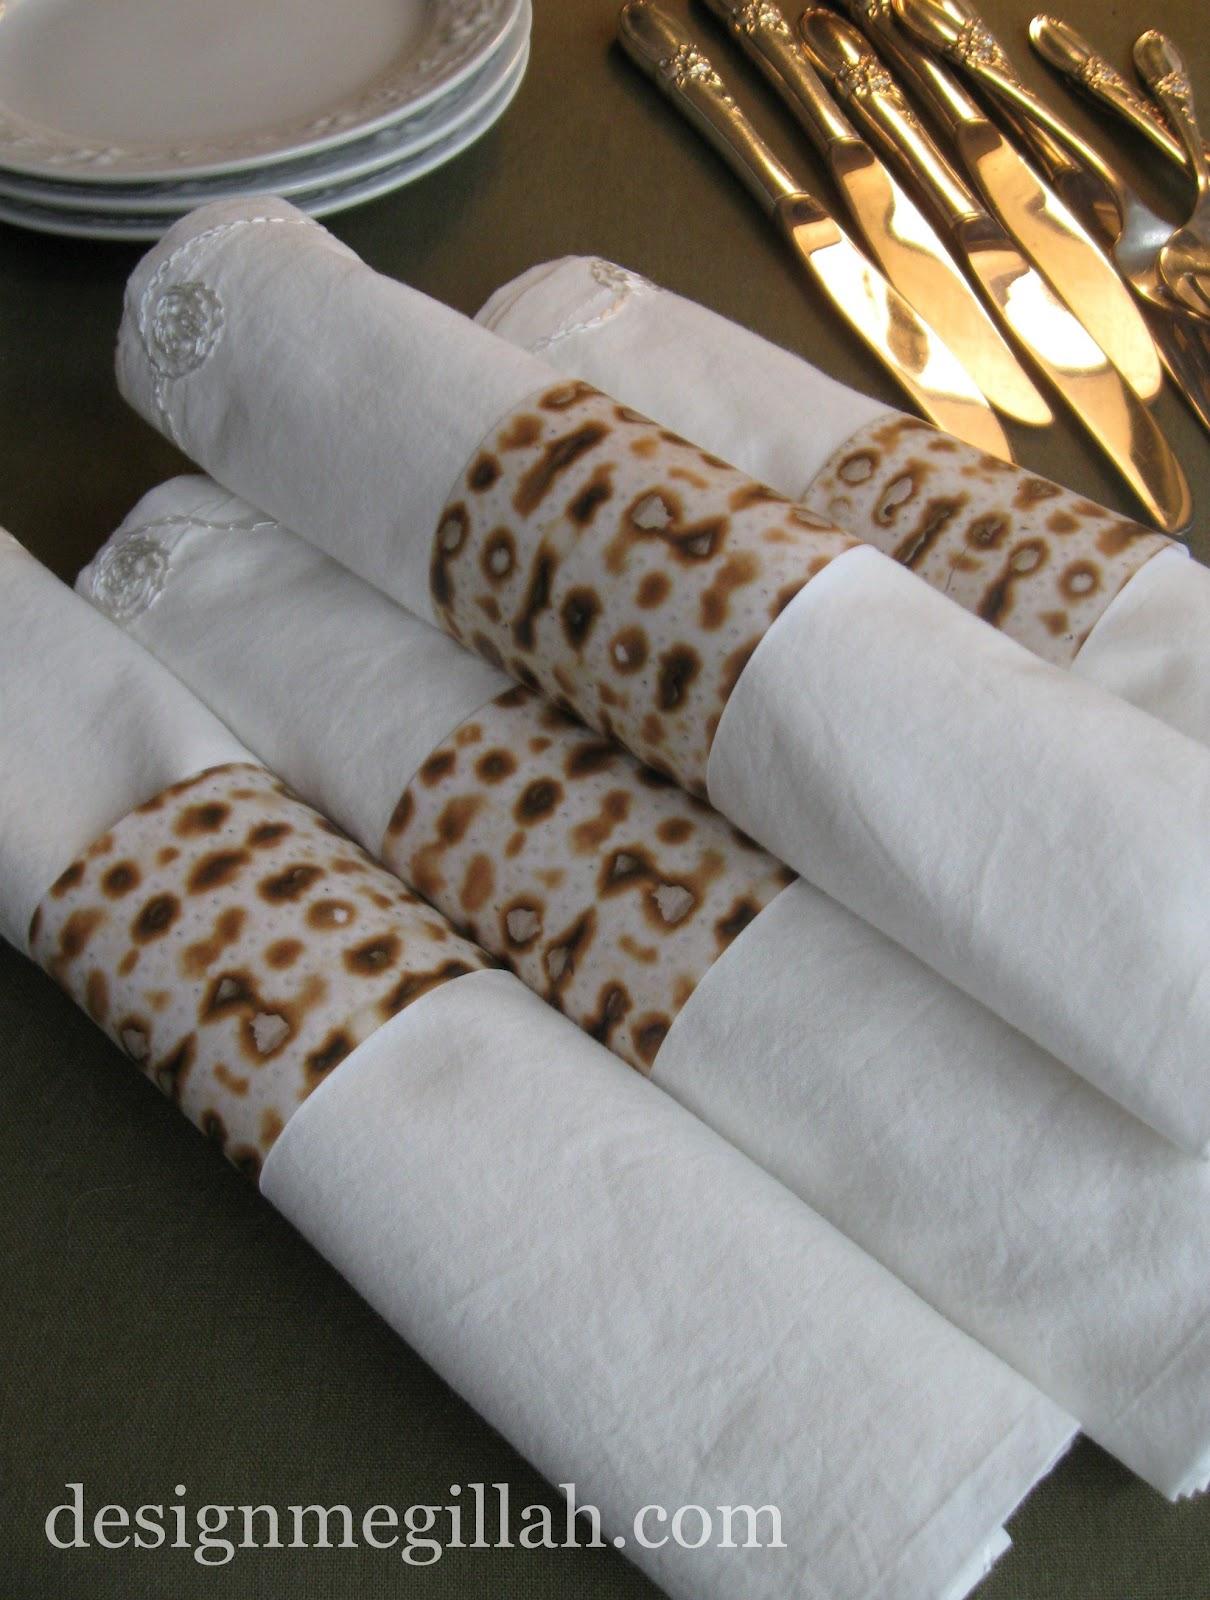 design megillah matzah napkin rings. Black Bedroom Furniture Sets. Home Design Ideas